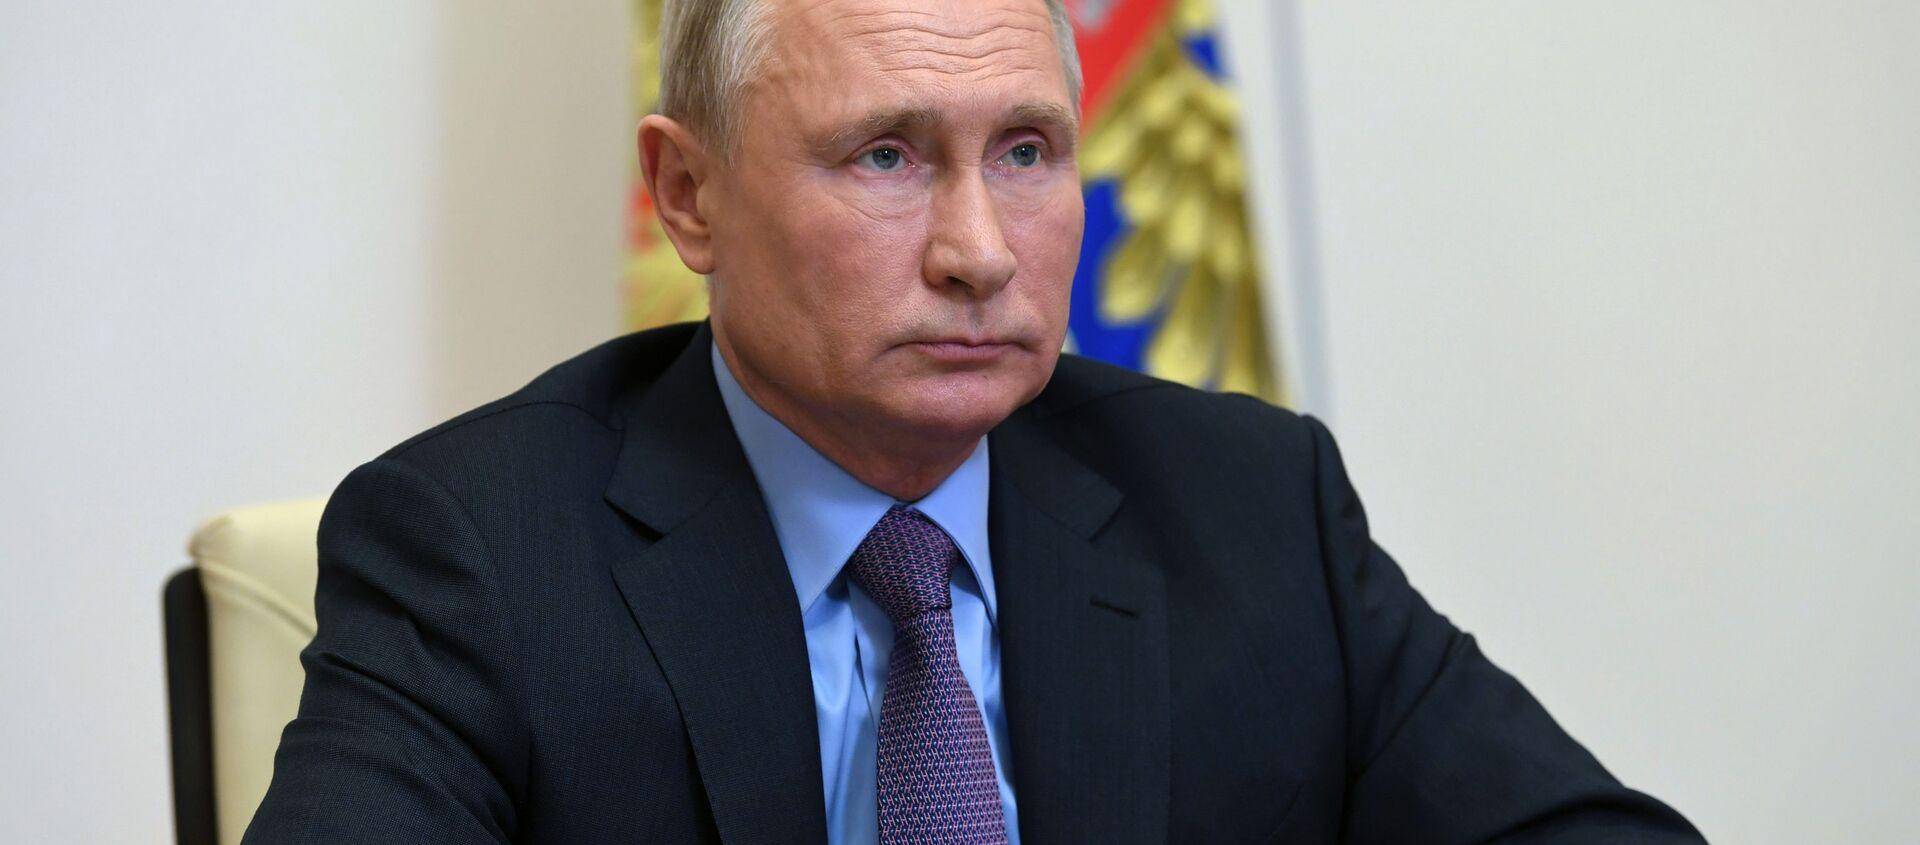 Prezydent Rosji Władimir Putin. - Sputnik Polska, 1920, 29.01.2021